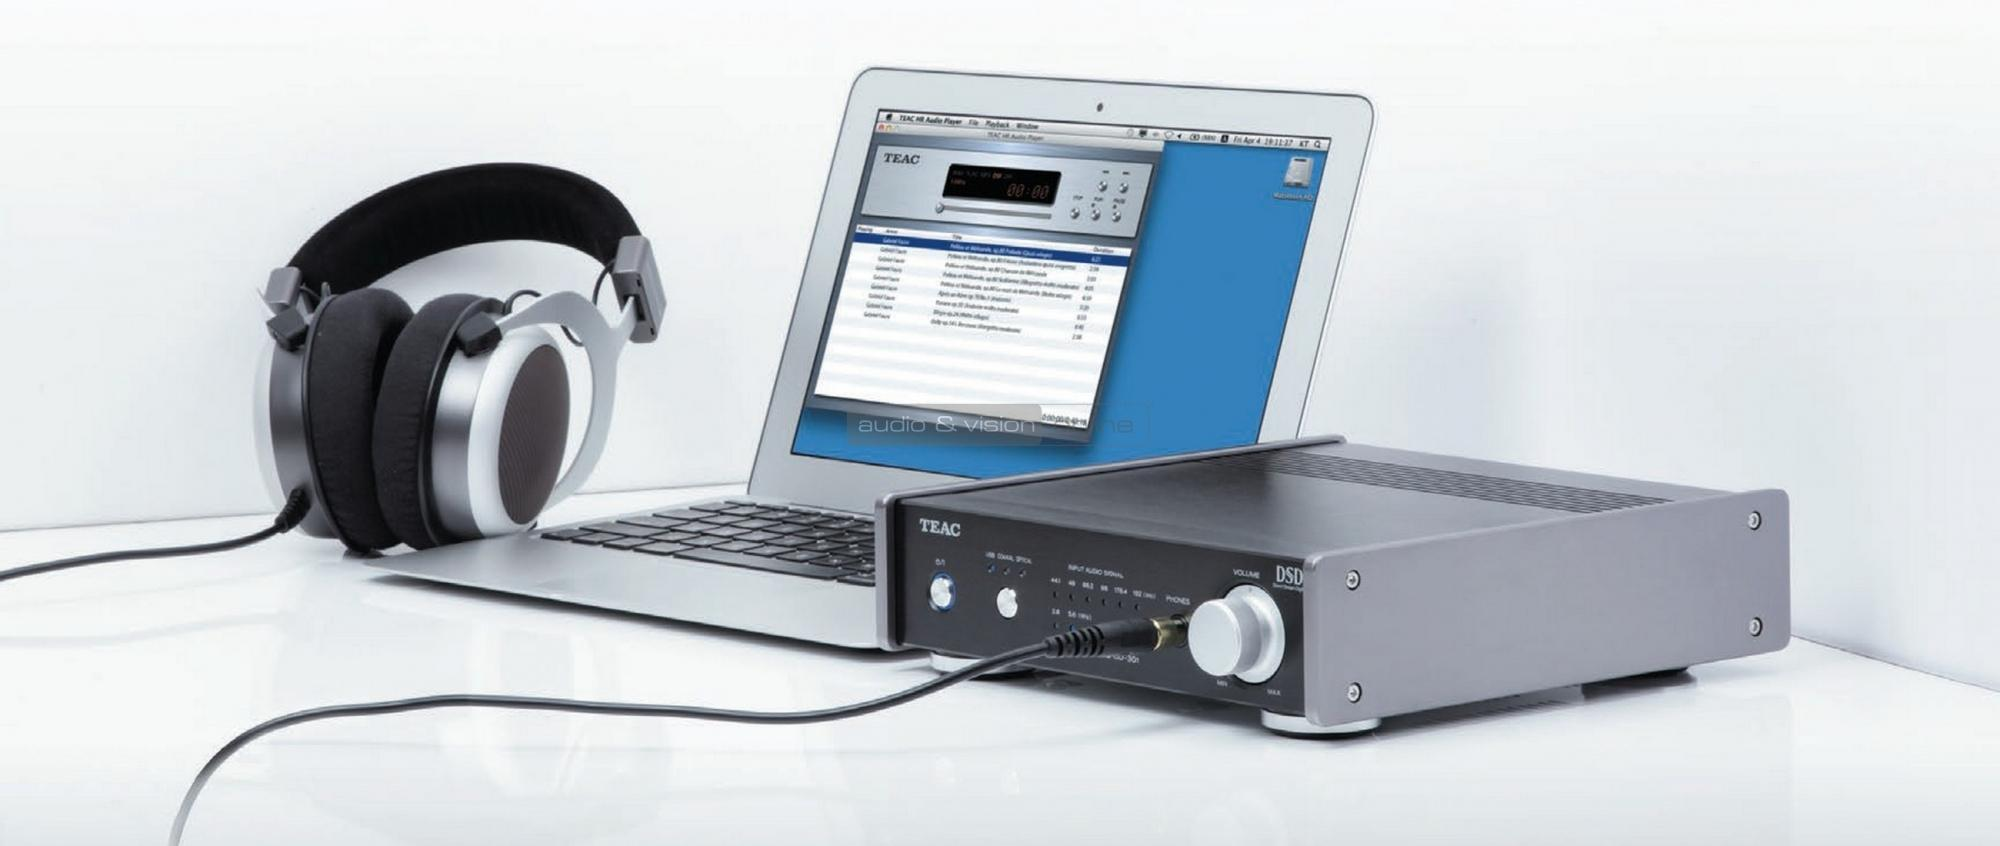 teac-ud-301-usb-dac-teszt-oldala